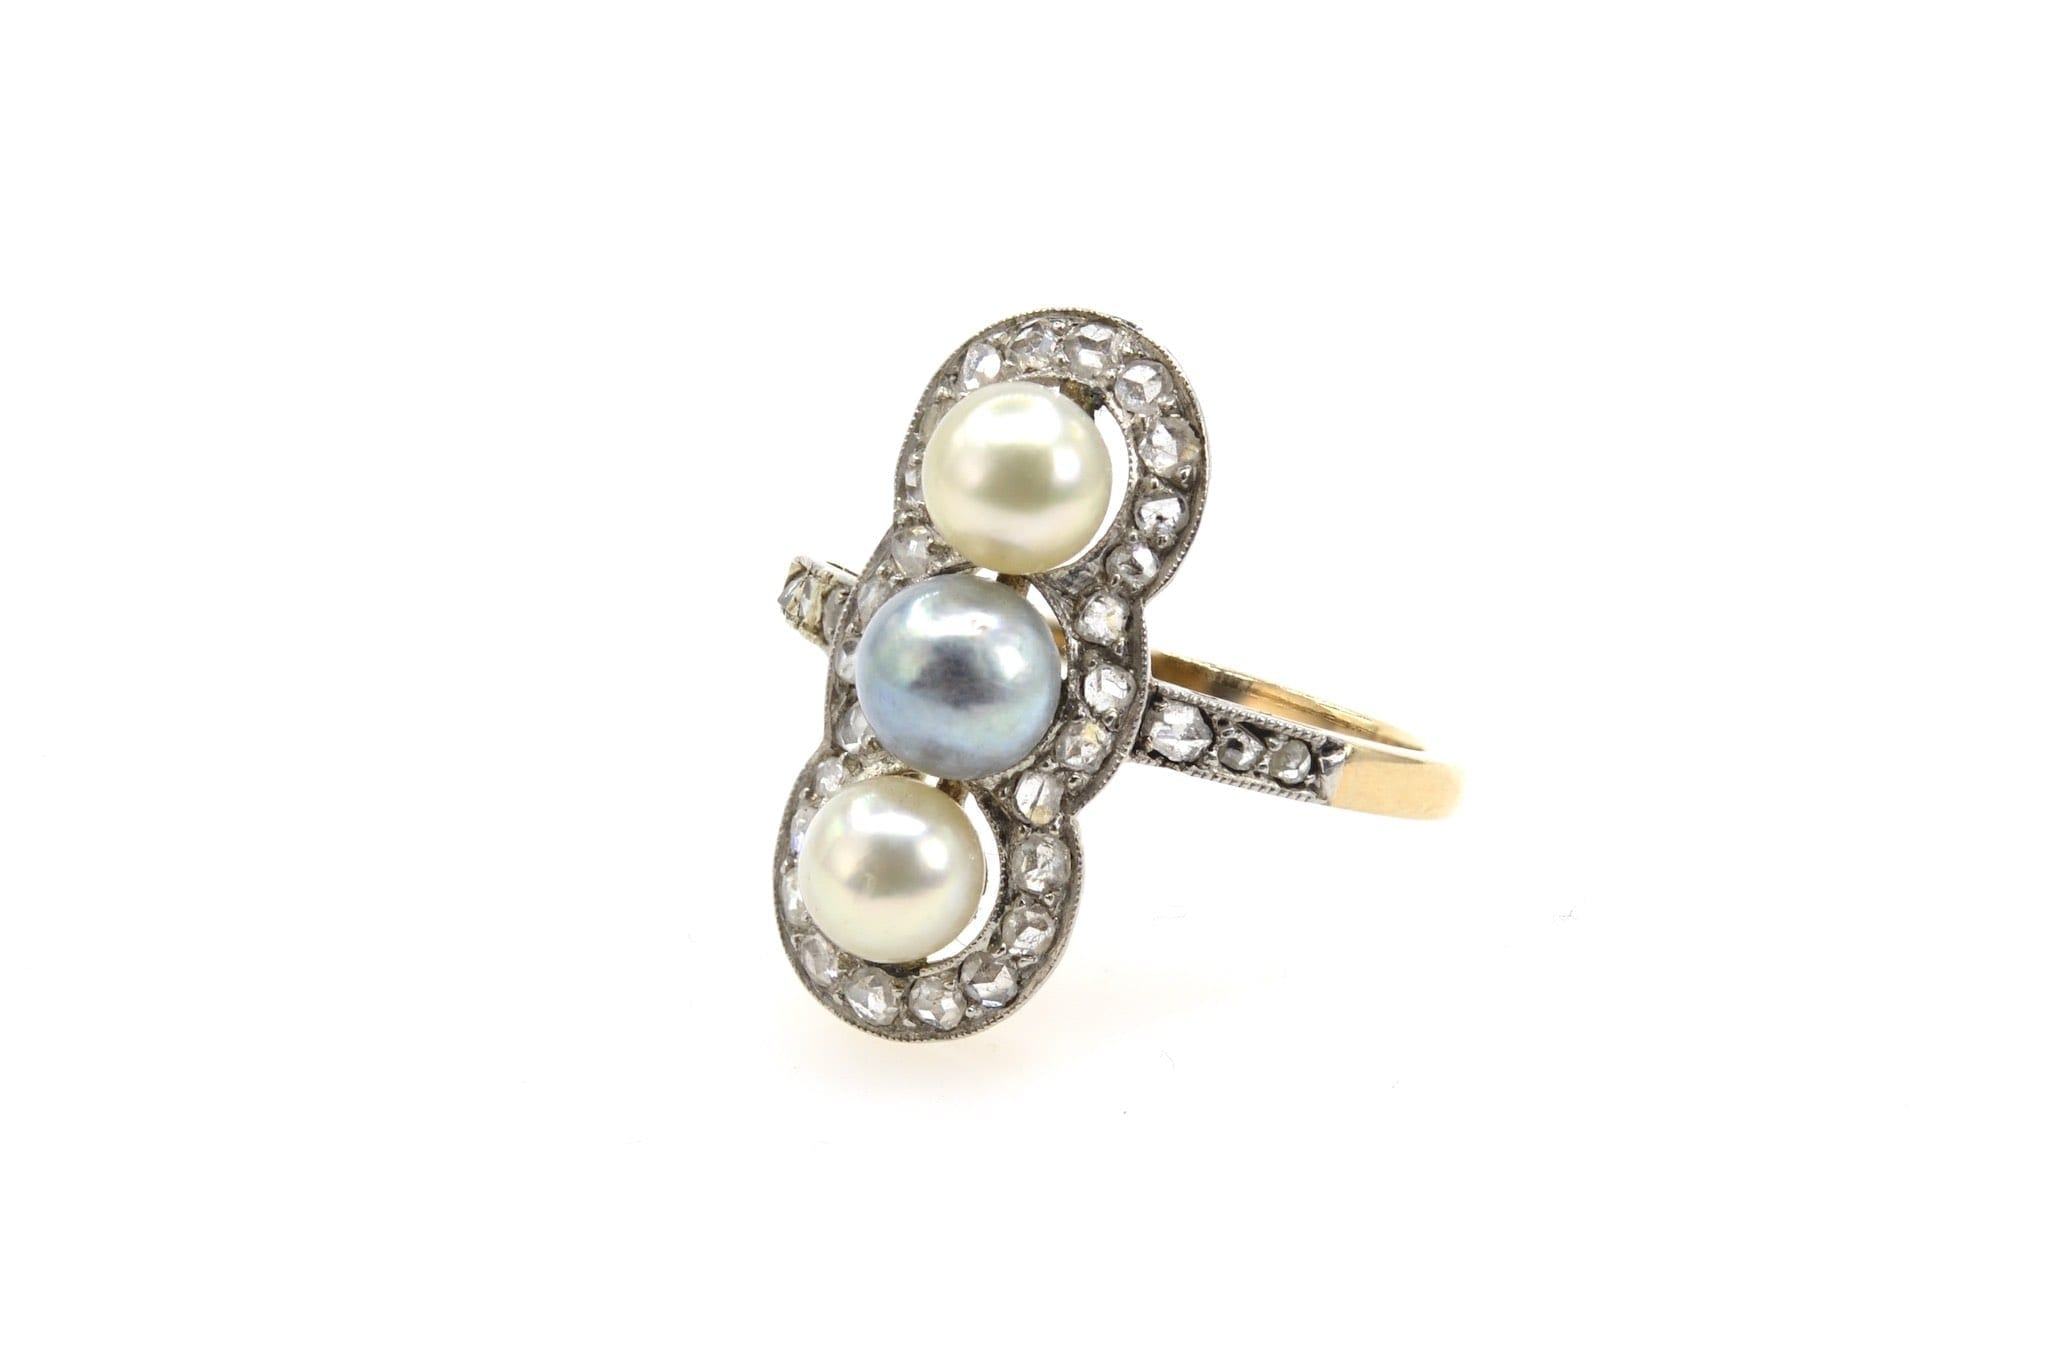 Bague 1900 perles et diamants en or jaune 18k et platine